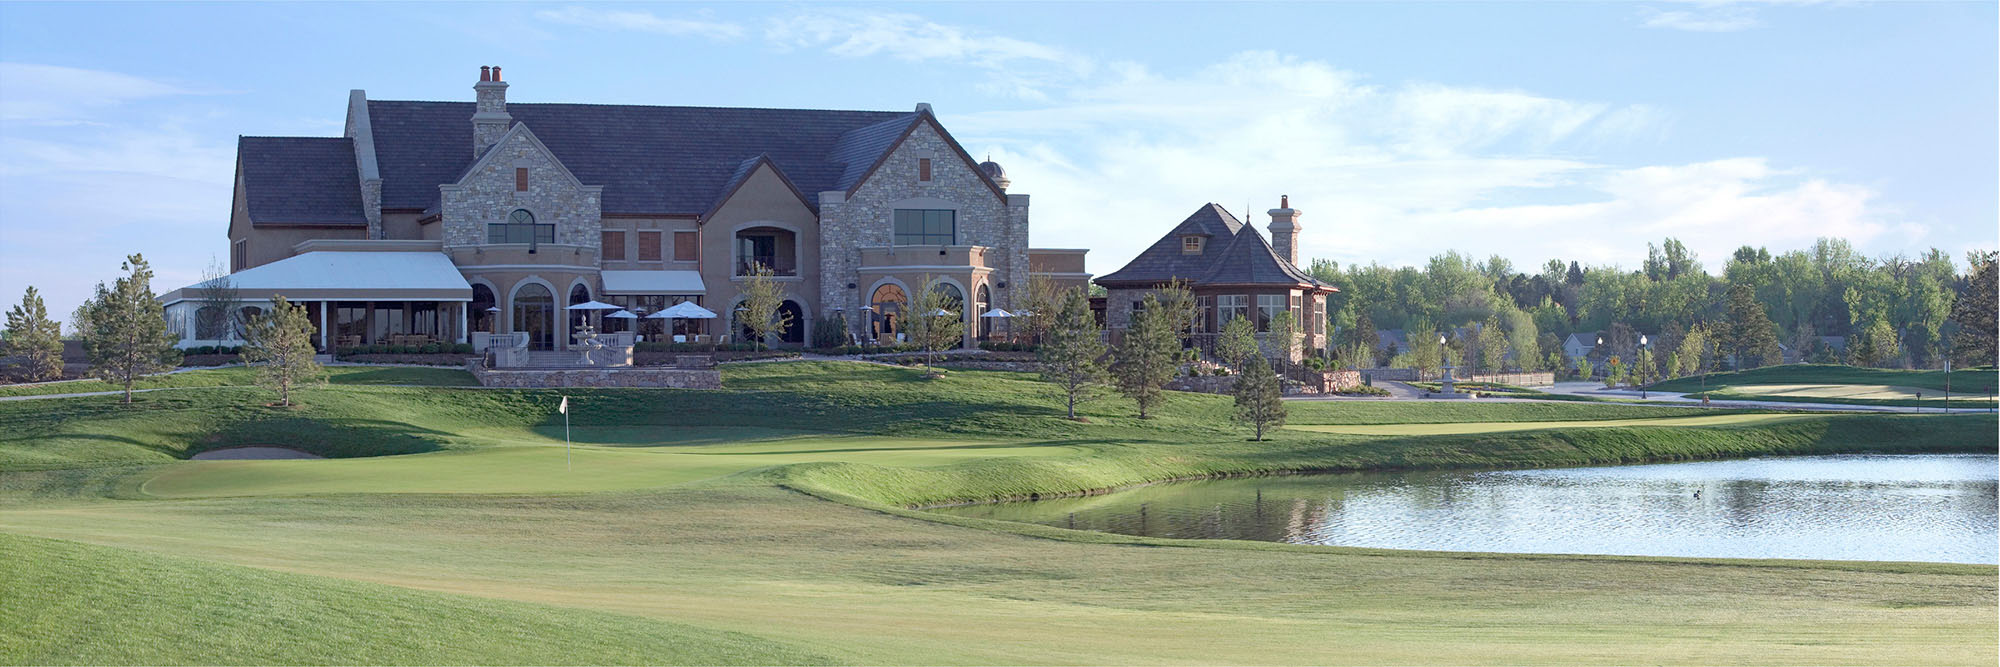 Golf Course Image - Cherry Creek No. 18